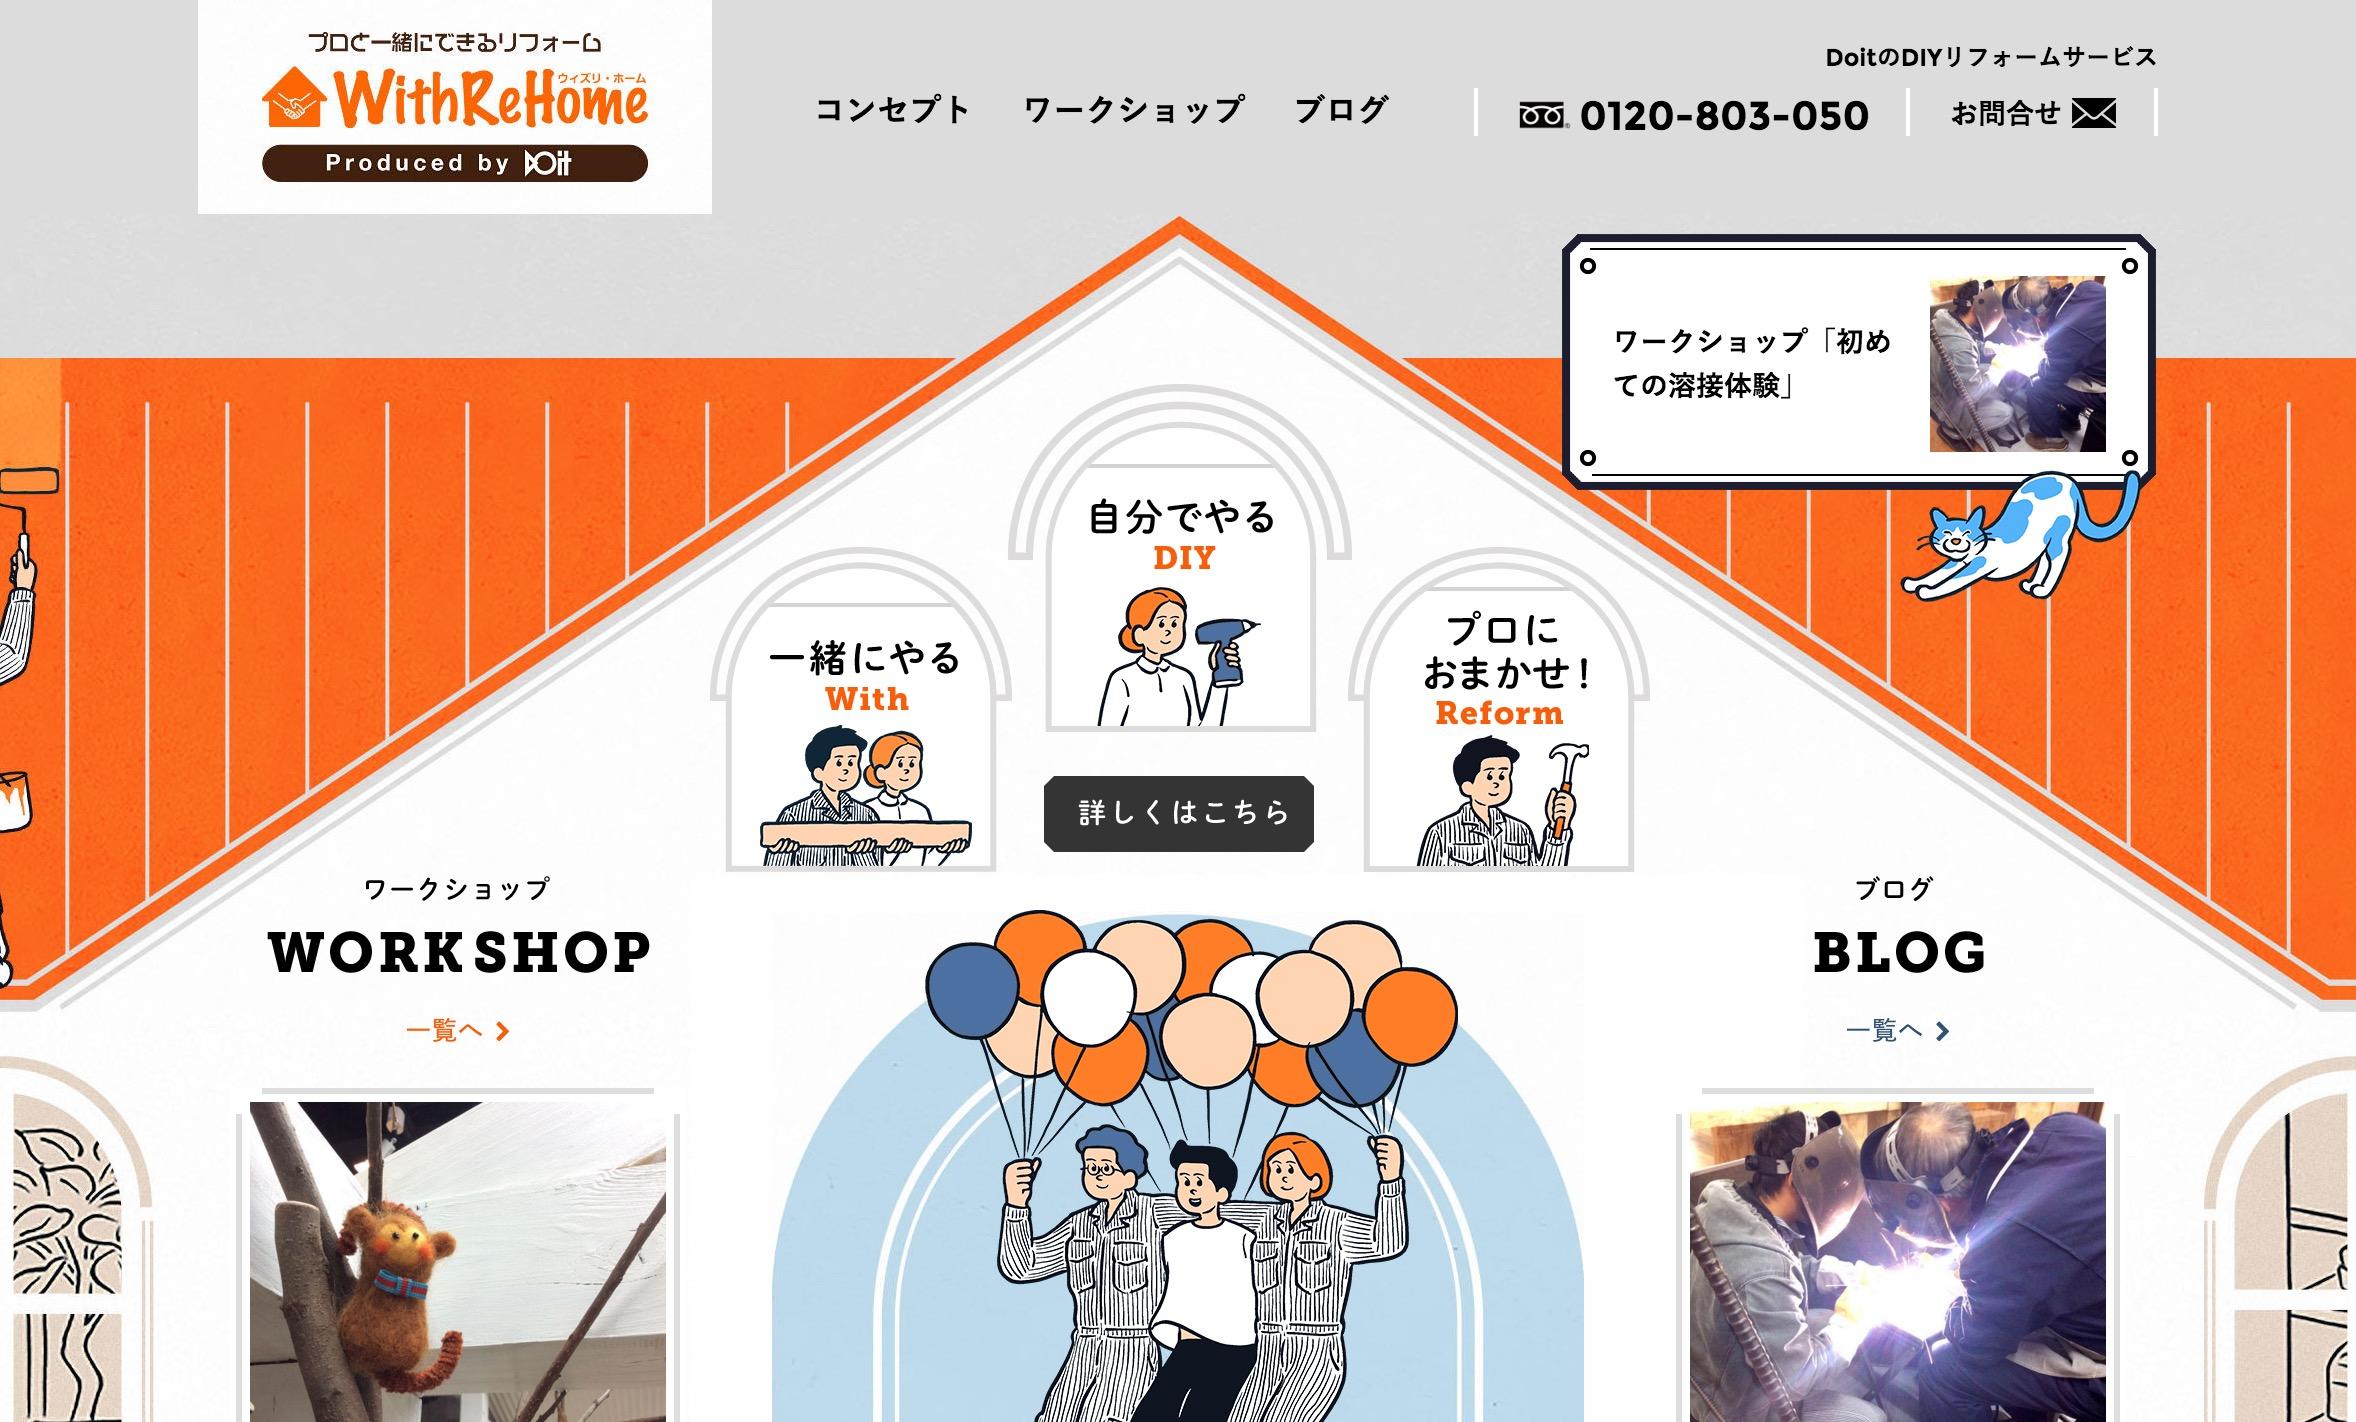 DoitのDIYリフォームサービス【WithReHome】